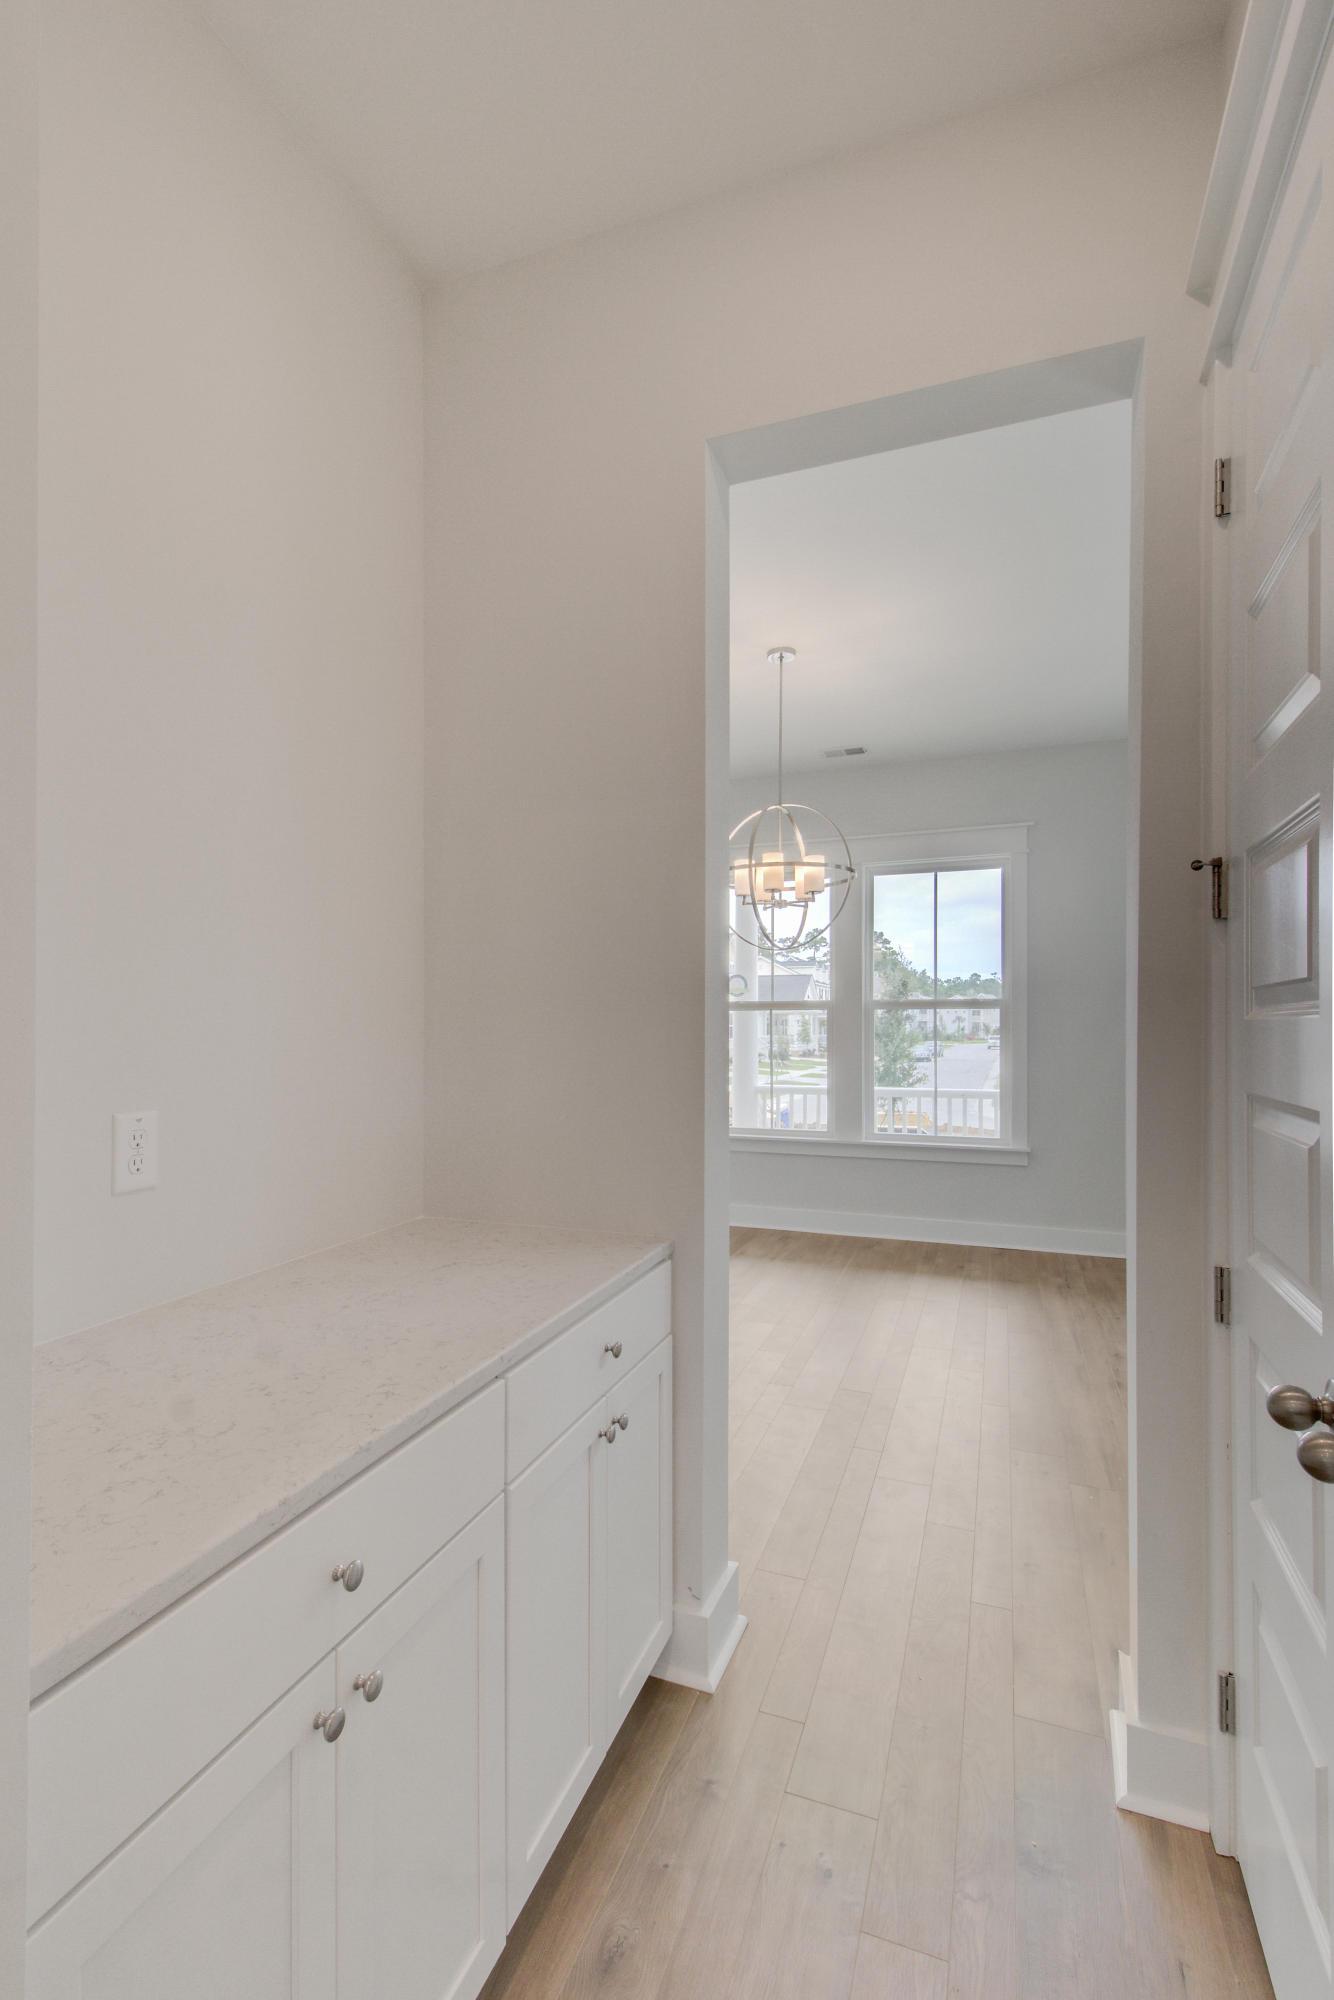 Carolina Park Homes For Sale - 1820 Agate Bay, Mount Pleasant, SC - 23